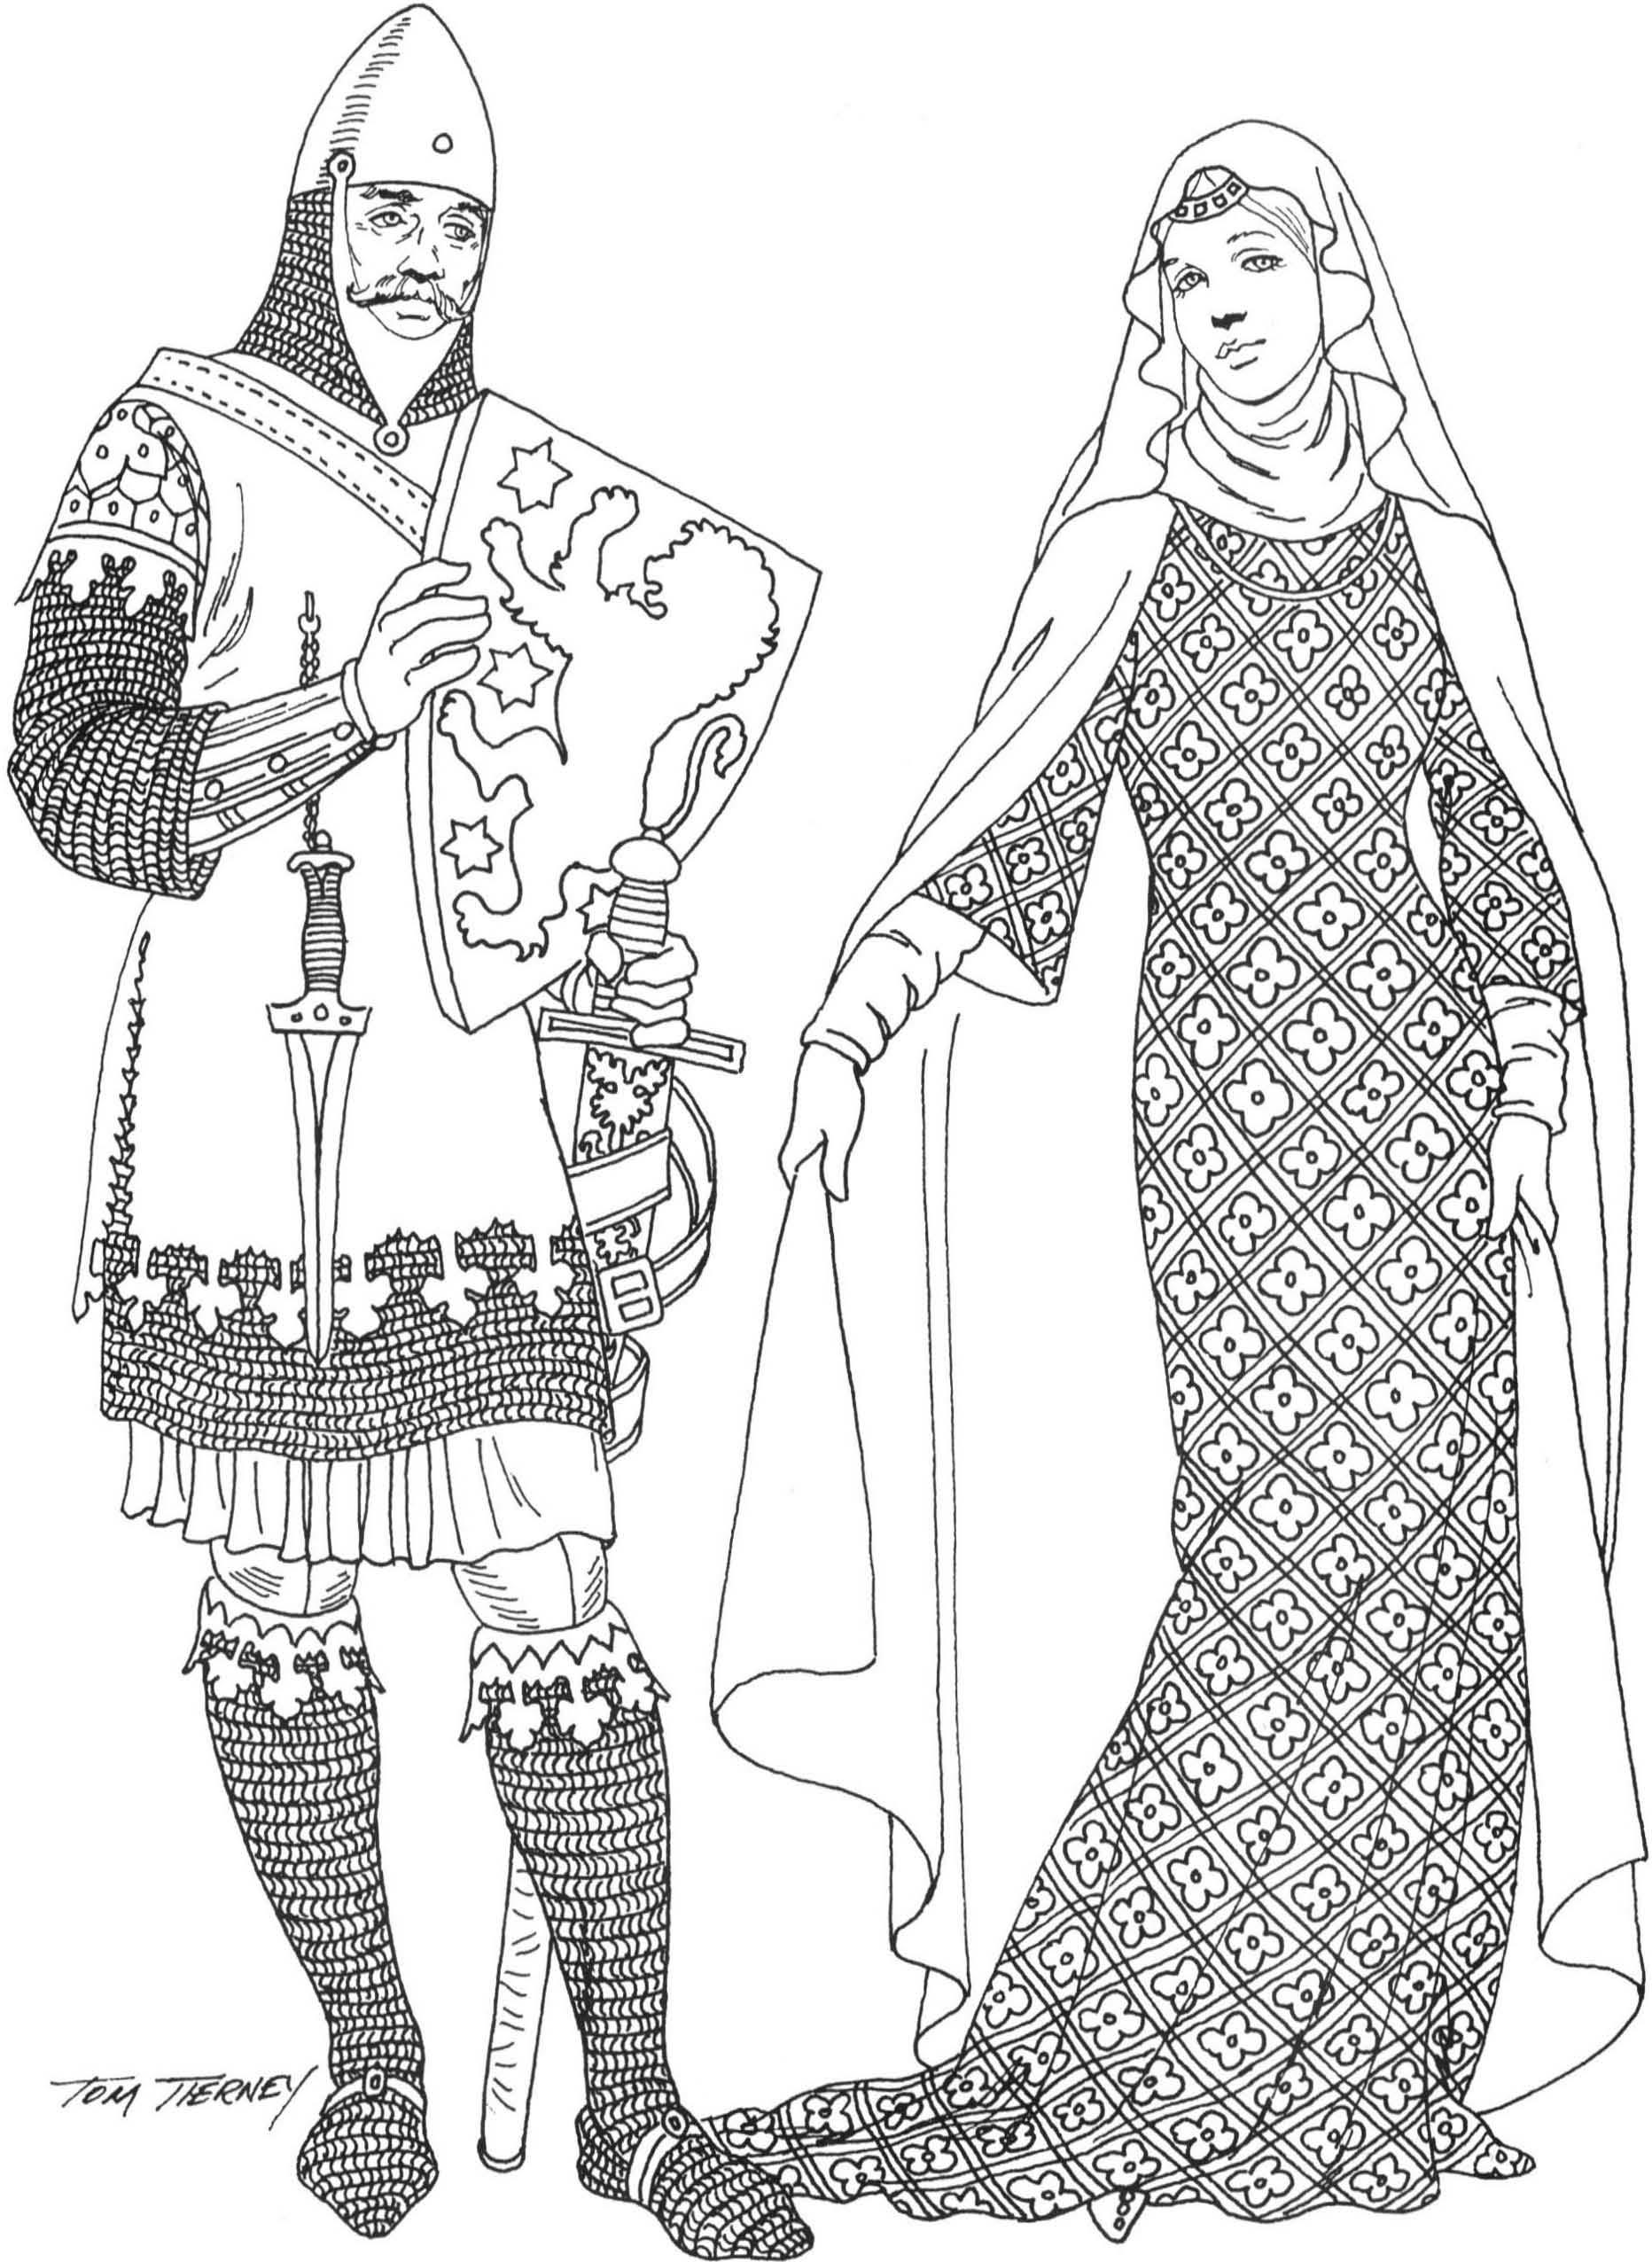 Englishmen Left: crusader knight wears chain mail hood